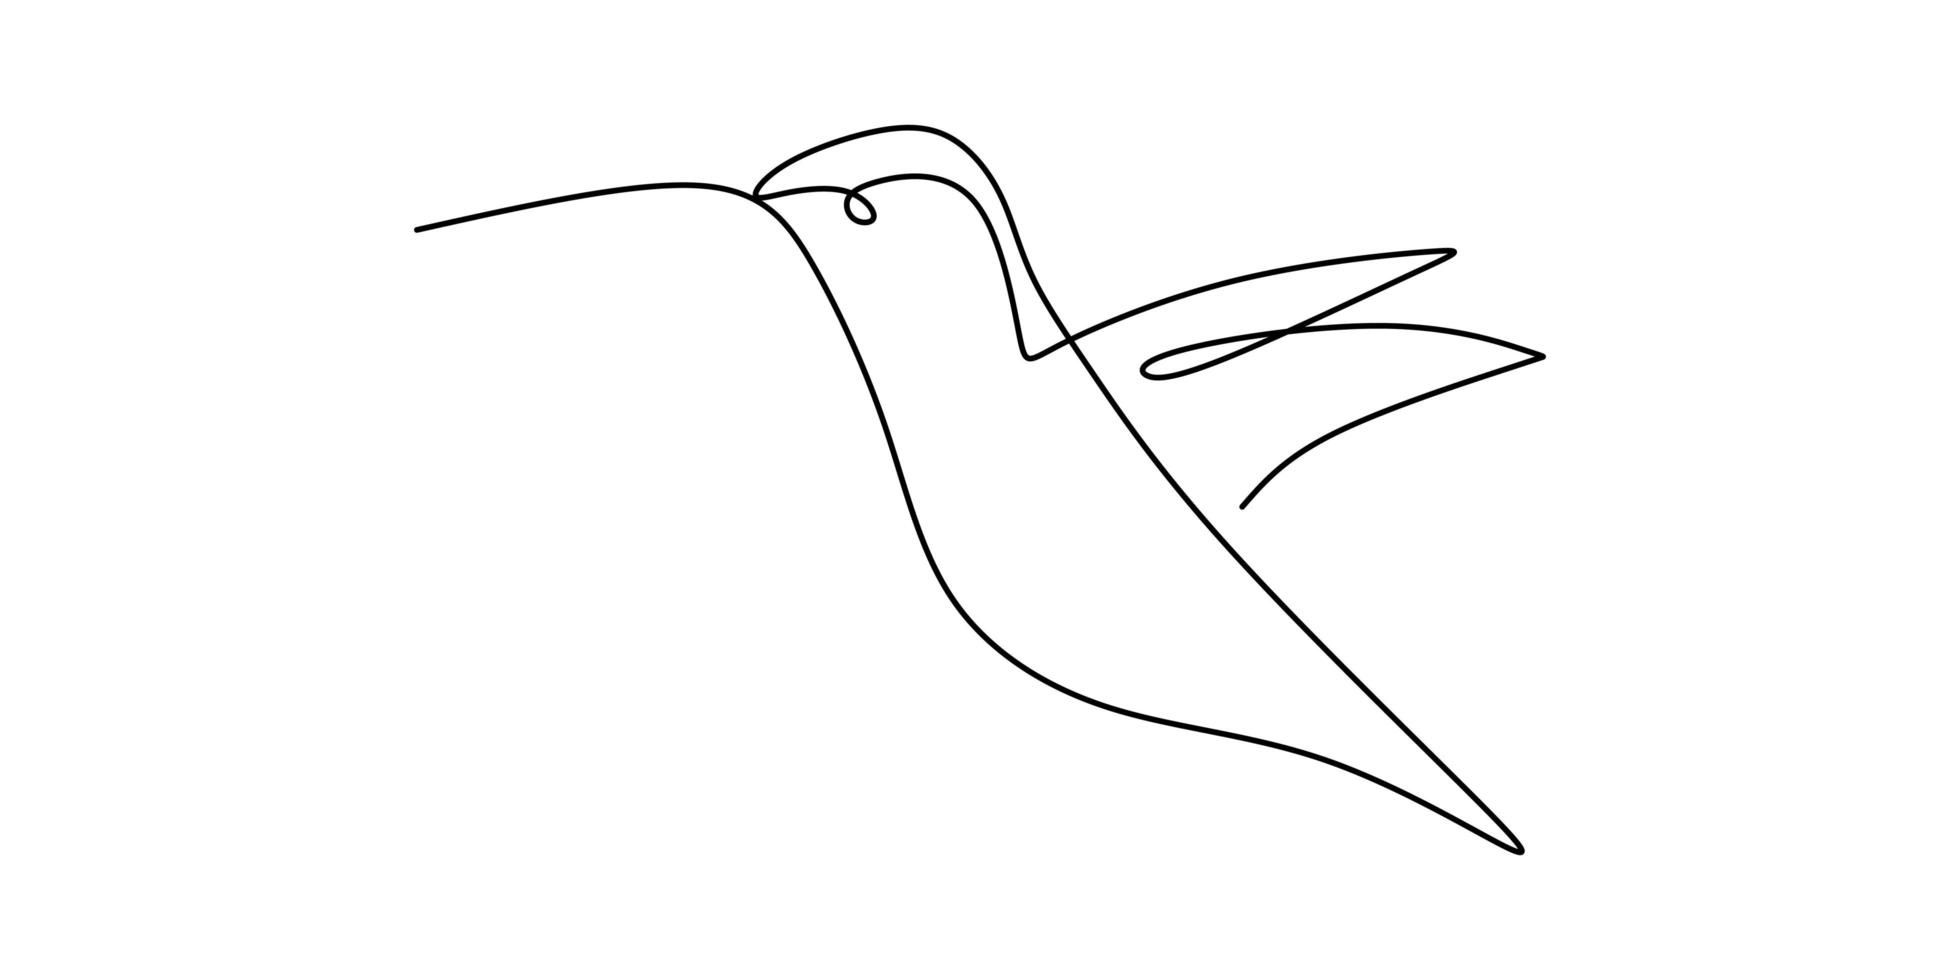 un dibujo de línea continua de lindo colibrí. dibujado a mano línea arte pájaro tropical. vector